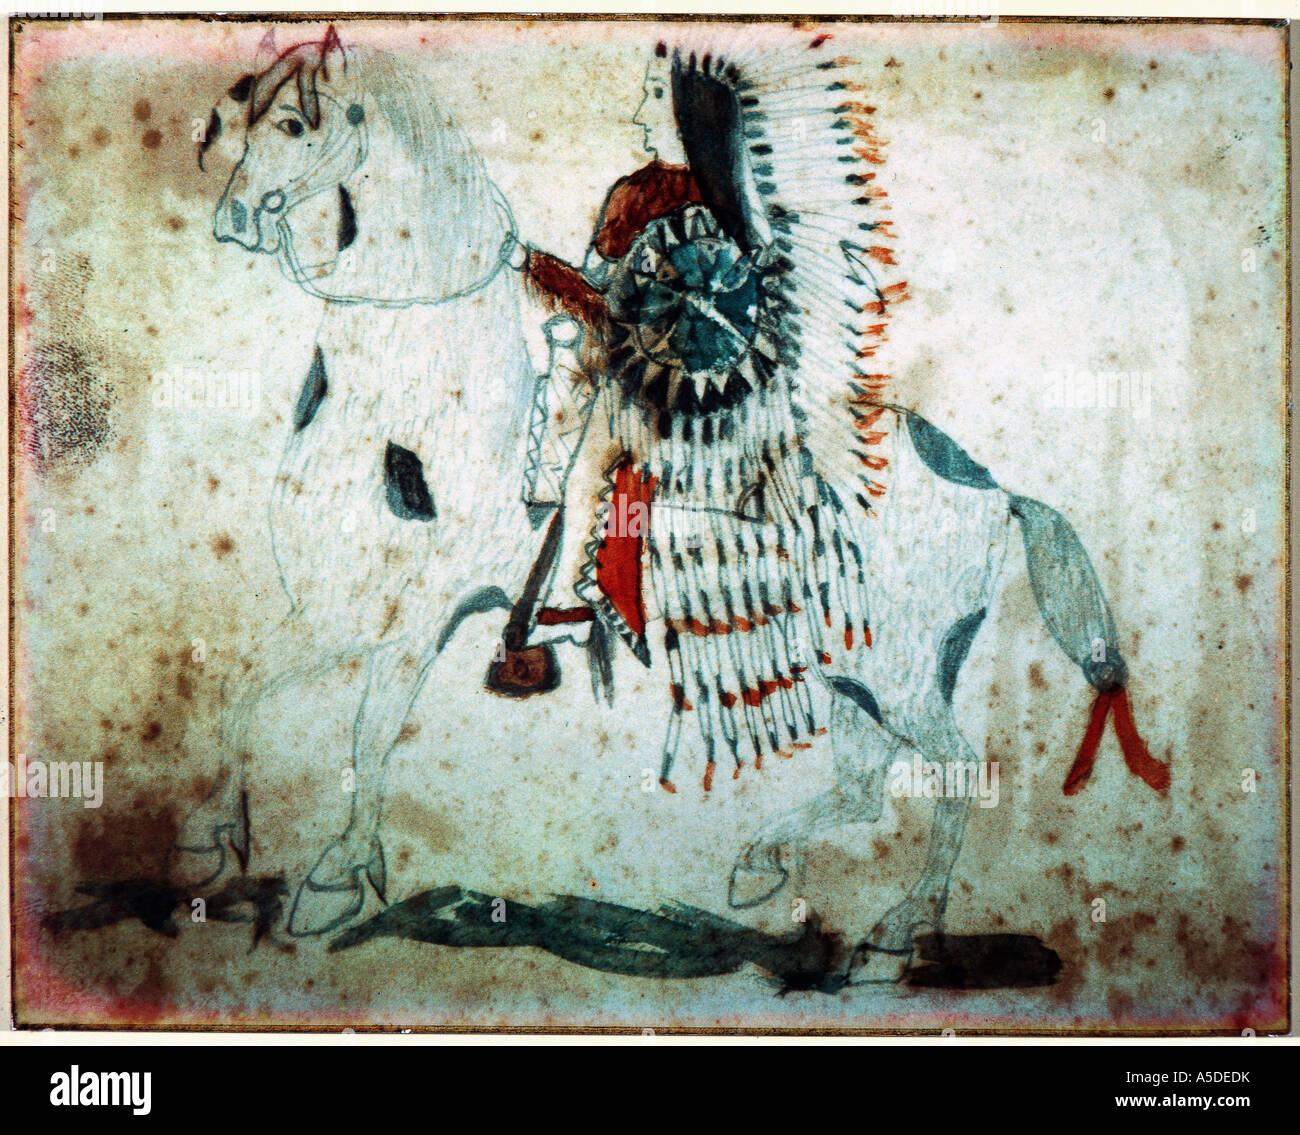 Indian painting of warrior on horseback - Stock Image